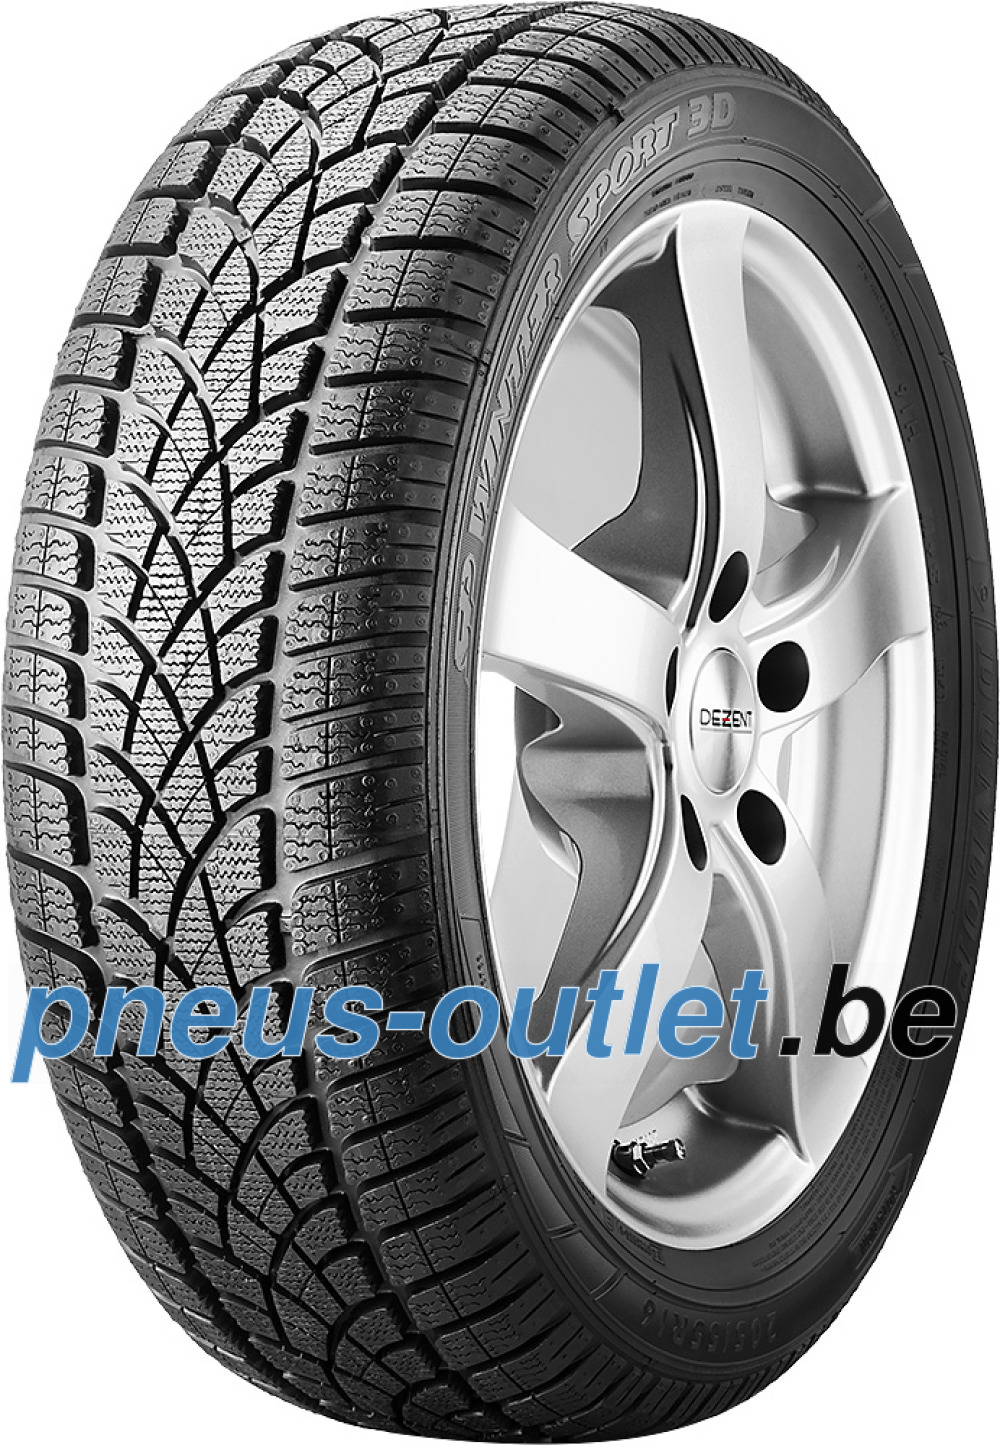 Dunlop SP Winter Sport 3D ( 225/40 R18 92V XL , avec protège-jante (MFS), AO BLT )